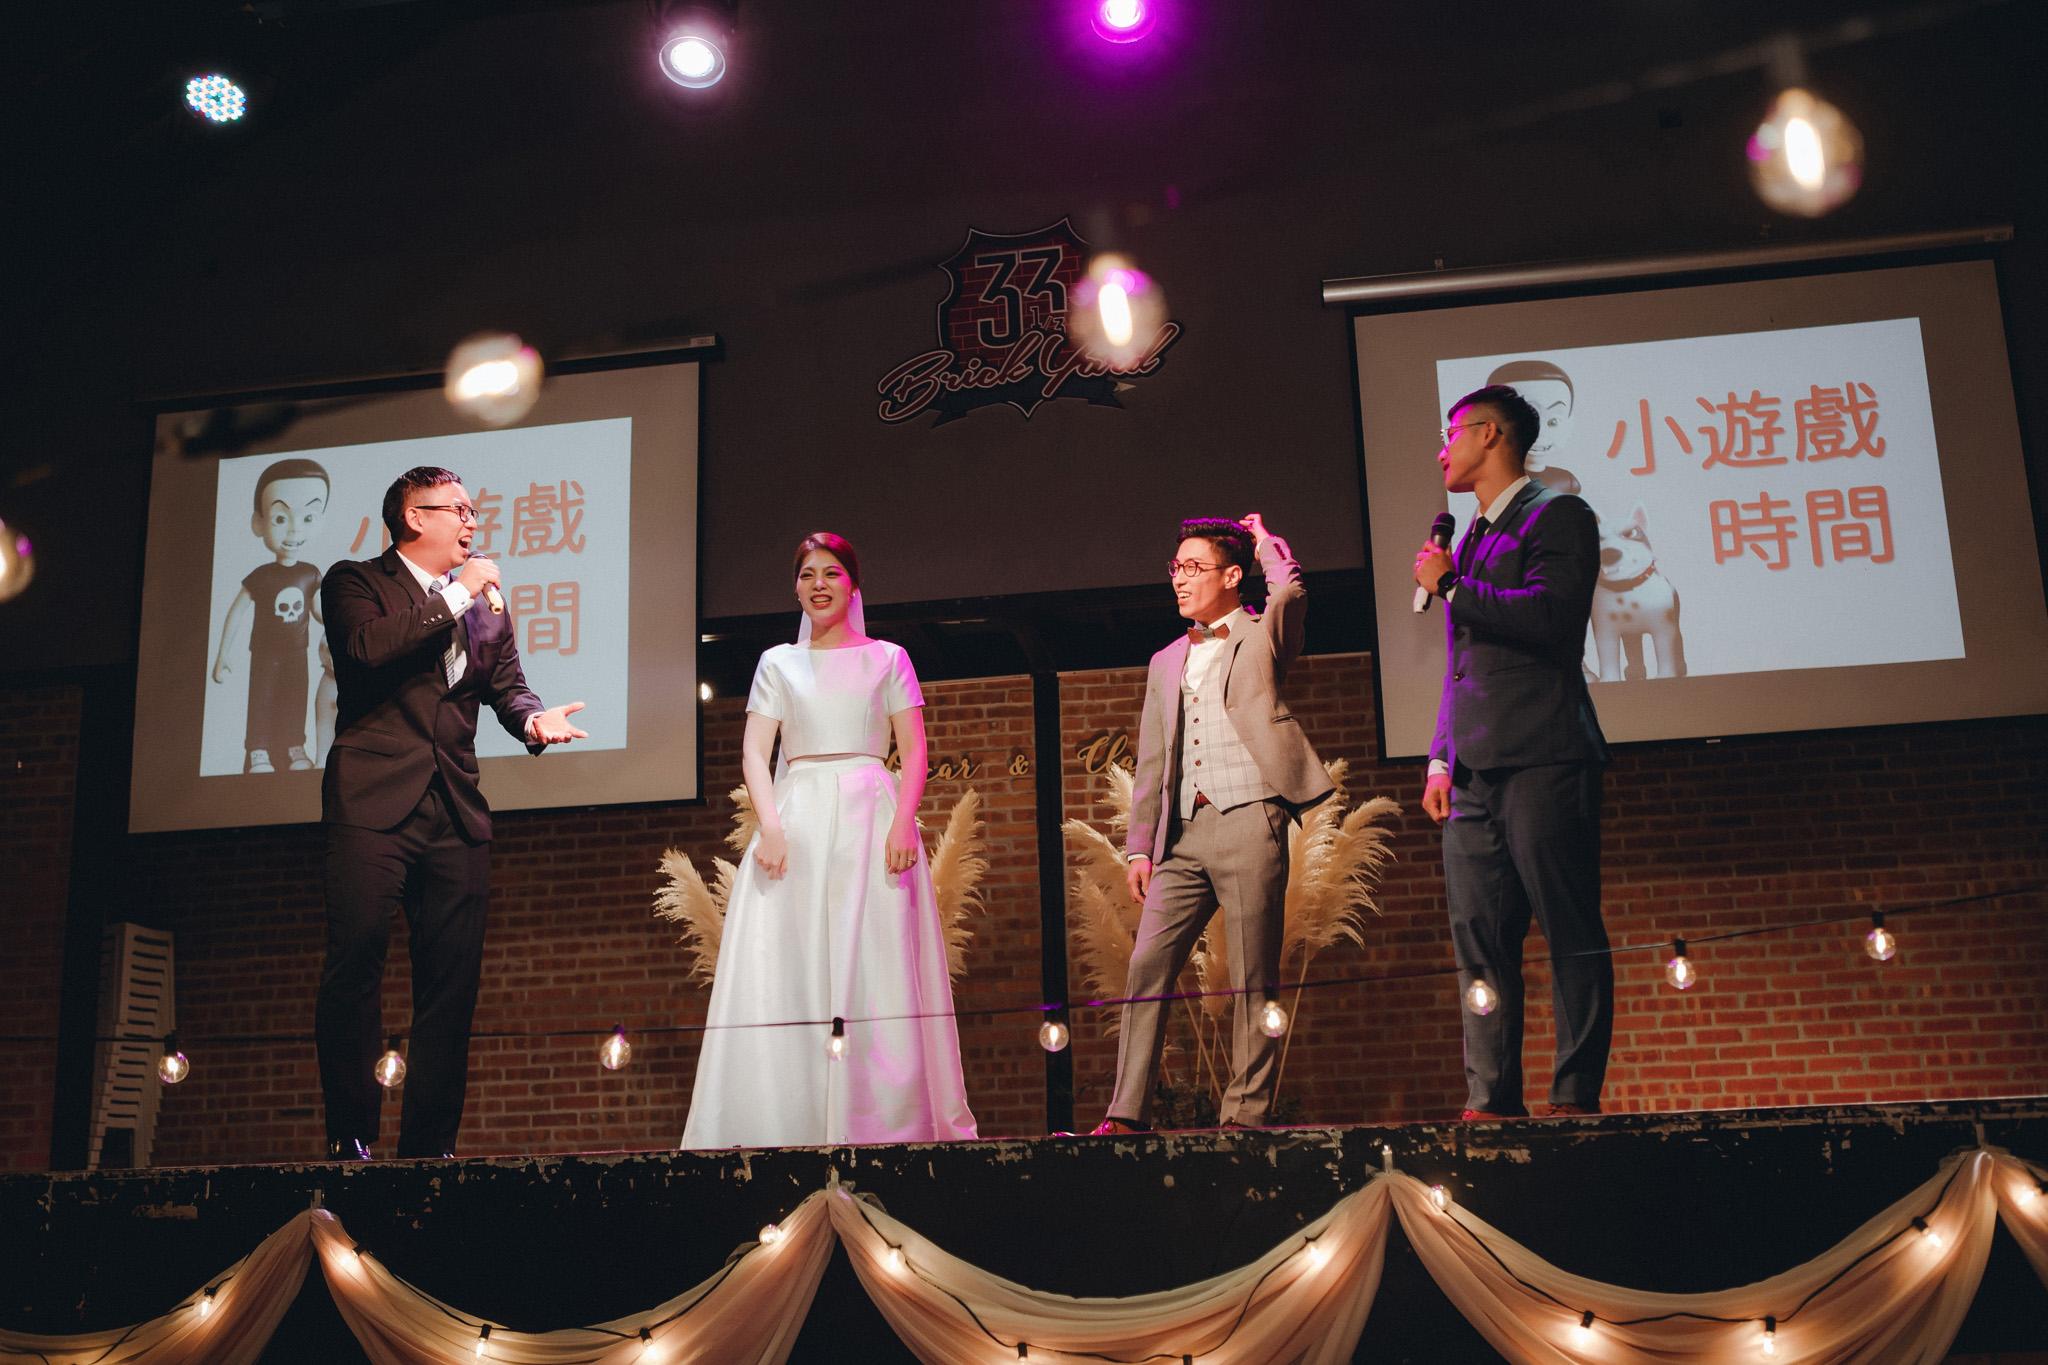 EW 台北婚攝 居米 濟南教會 Brick Yard 33 美軍俱樂部 婚禮 婚宴-86